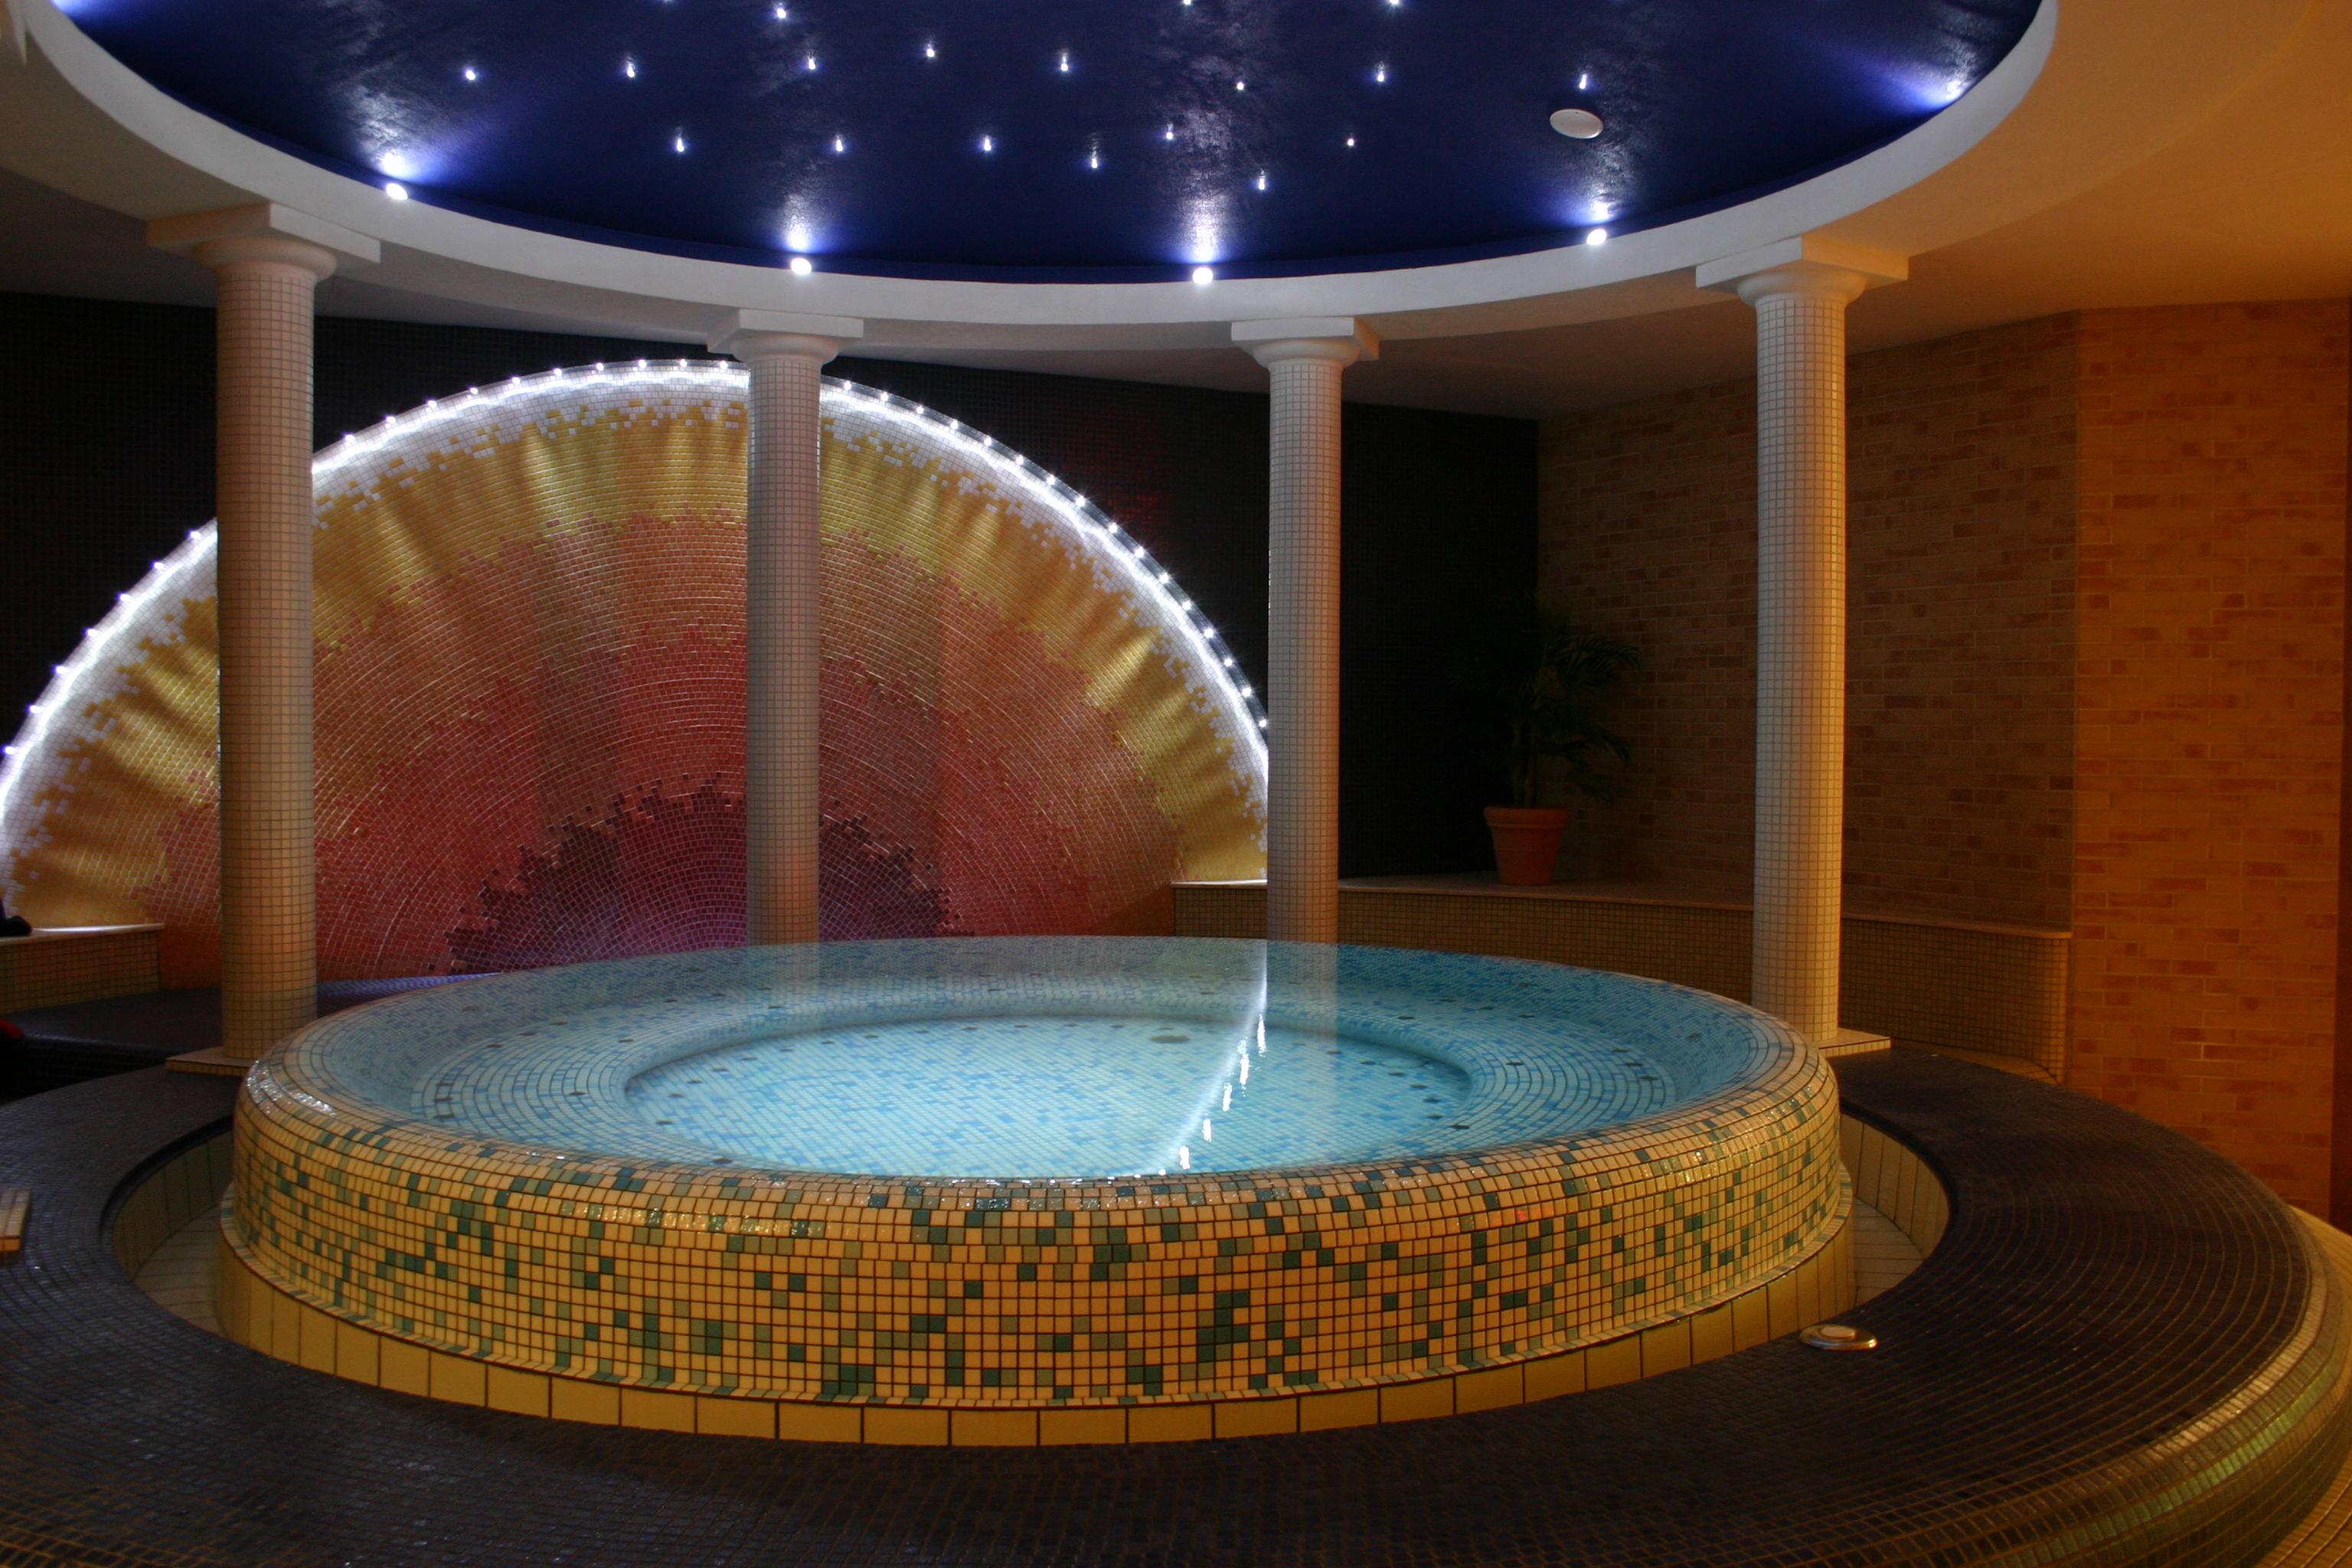 bains remous mato sauna. Black Bedroom Furniture Sets. Home Design Ideas